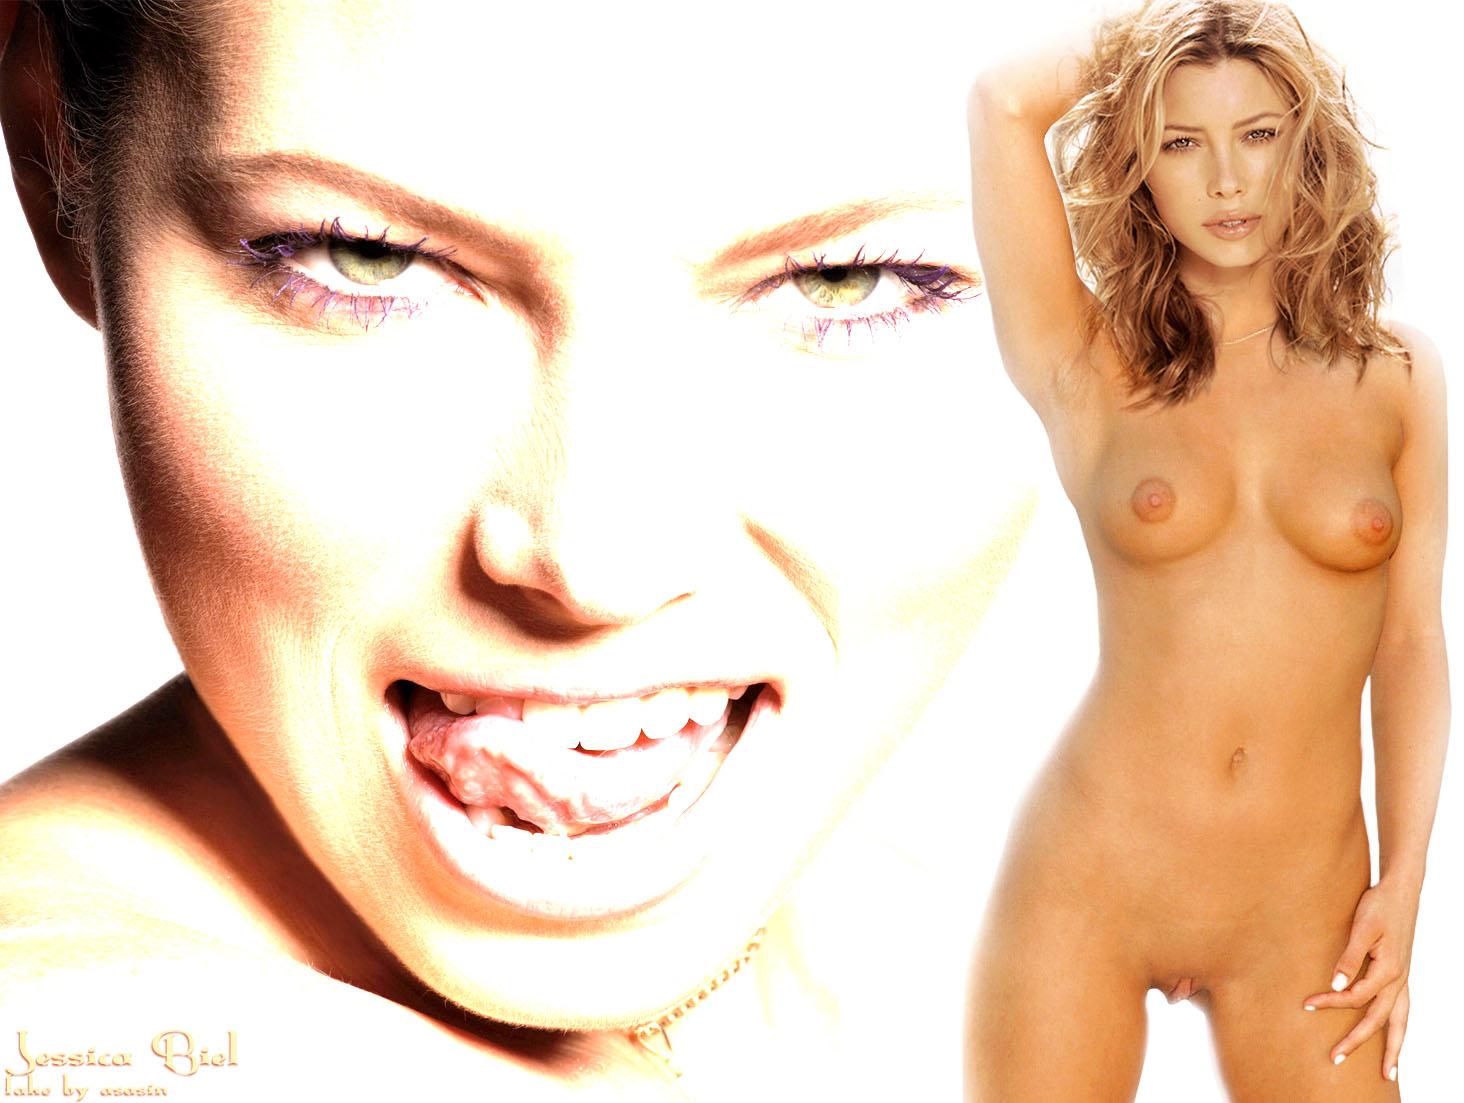 Jessica Biel Naked Deepfake Porn